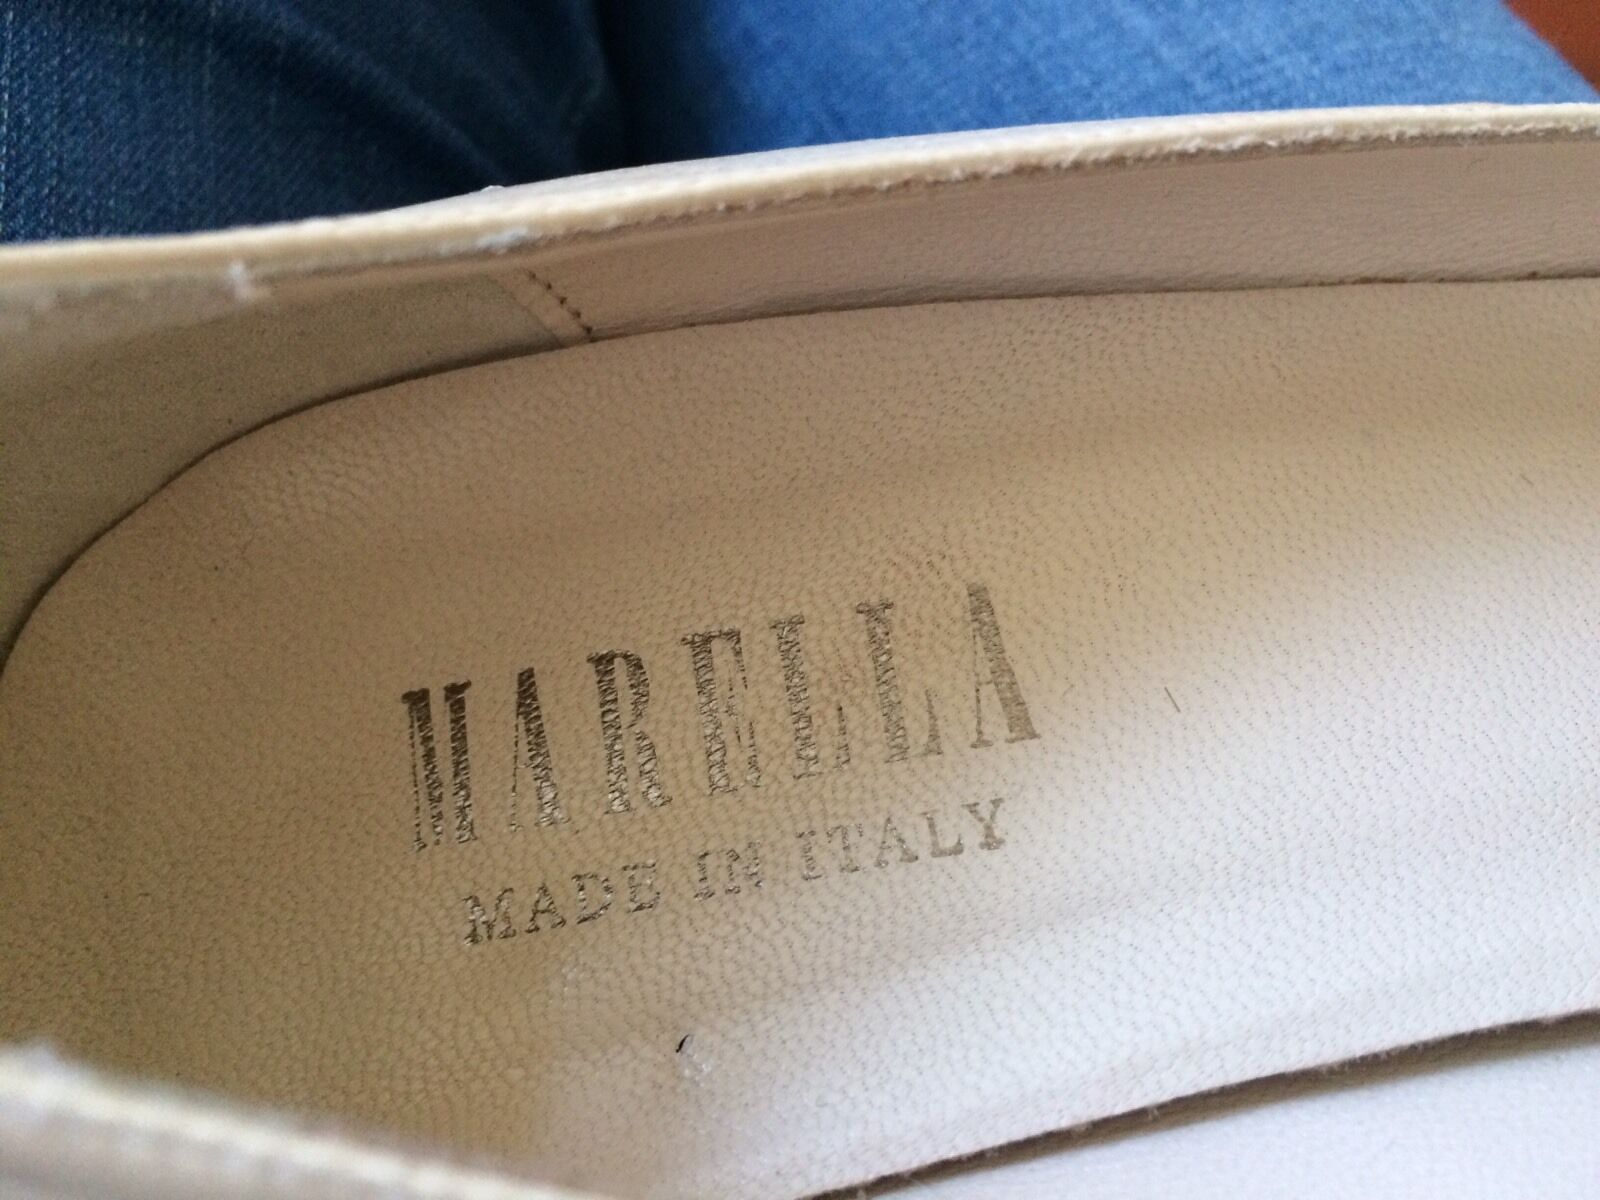 Traumhafte Schuhe gr 38 Top!